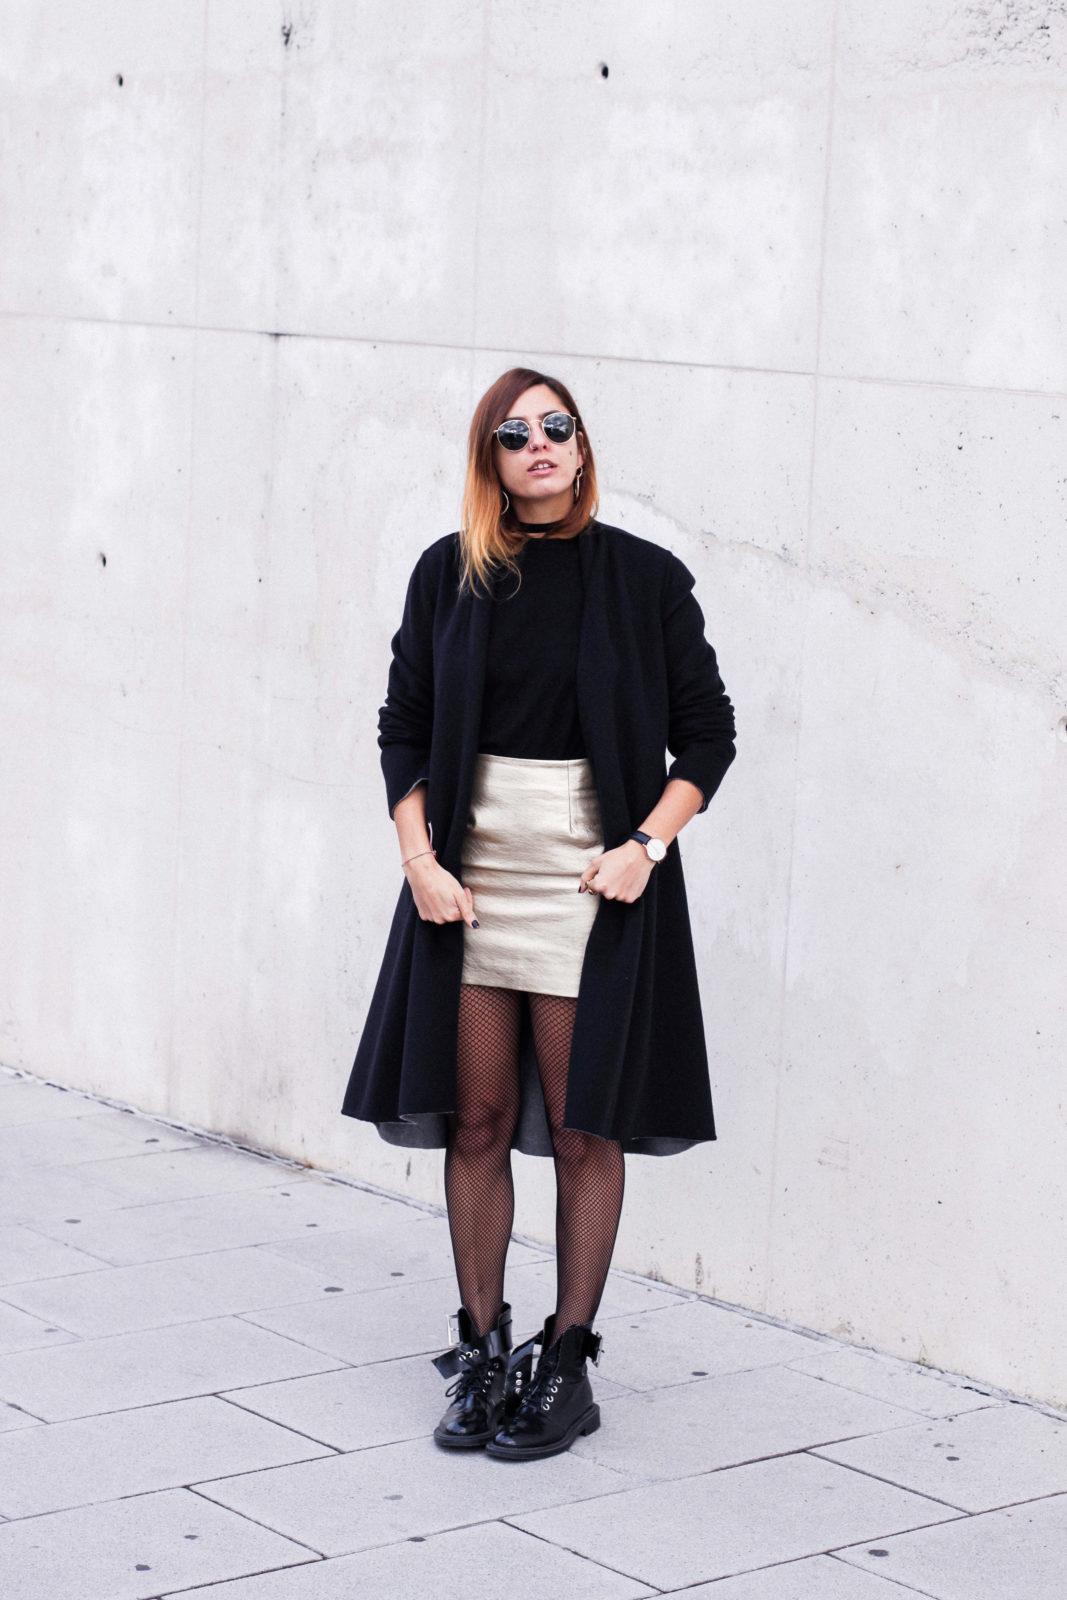 falda_dorada_shein_metalizado_medias_de_rejilla_choker_donkeycool_street_style_trends_2016-9